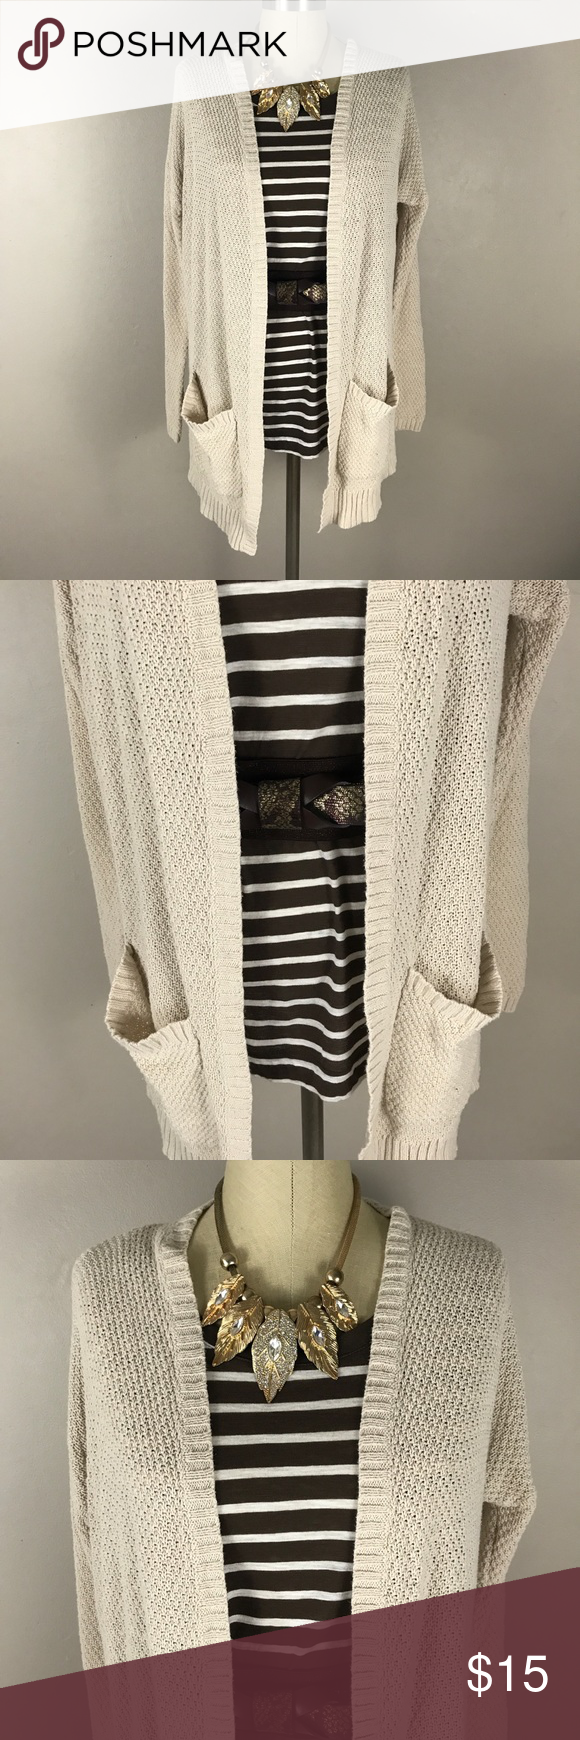 8a81ecc571 UO BDG Cream Open Knit cardigan sweater sz M Urban outfitters BDG Cream  Open Knit cardigan